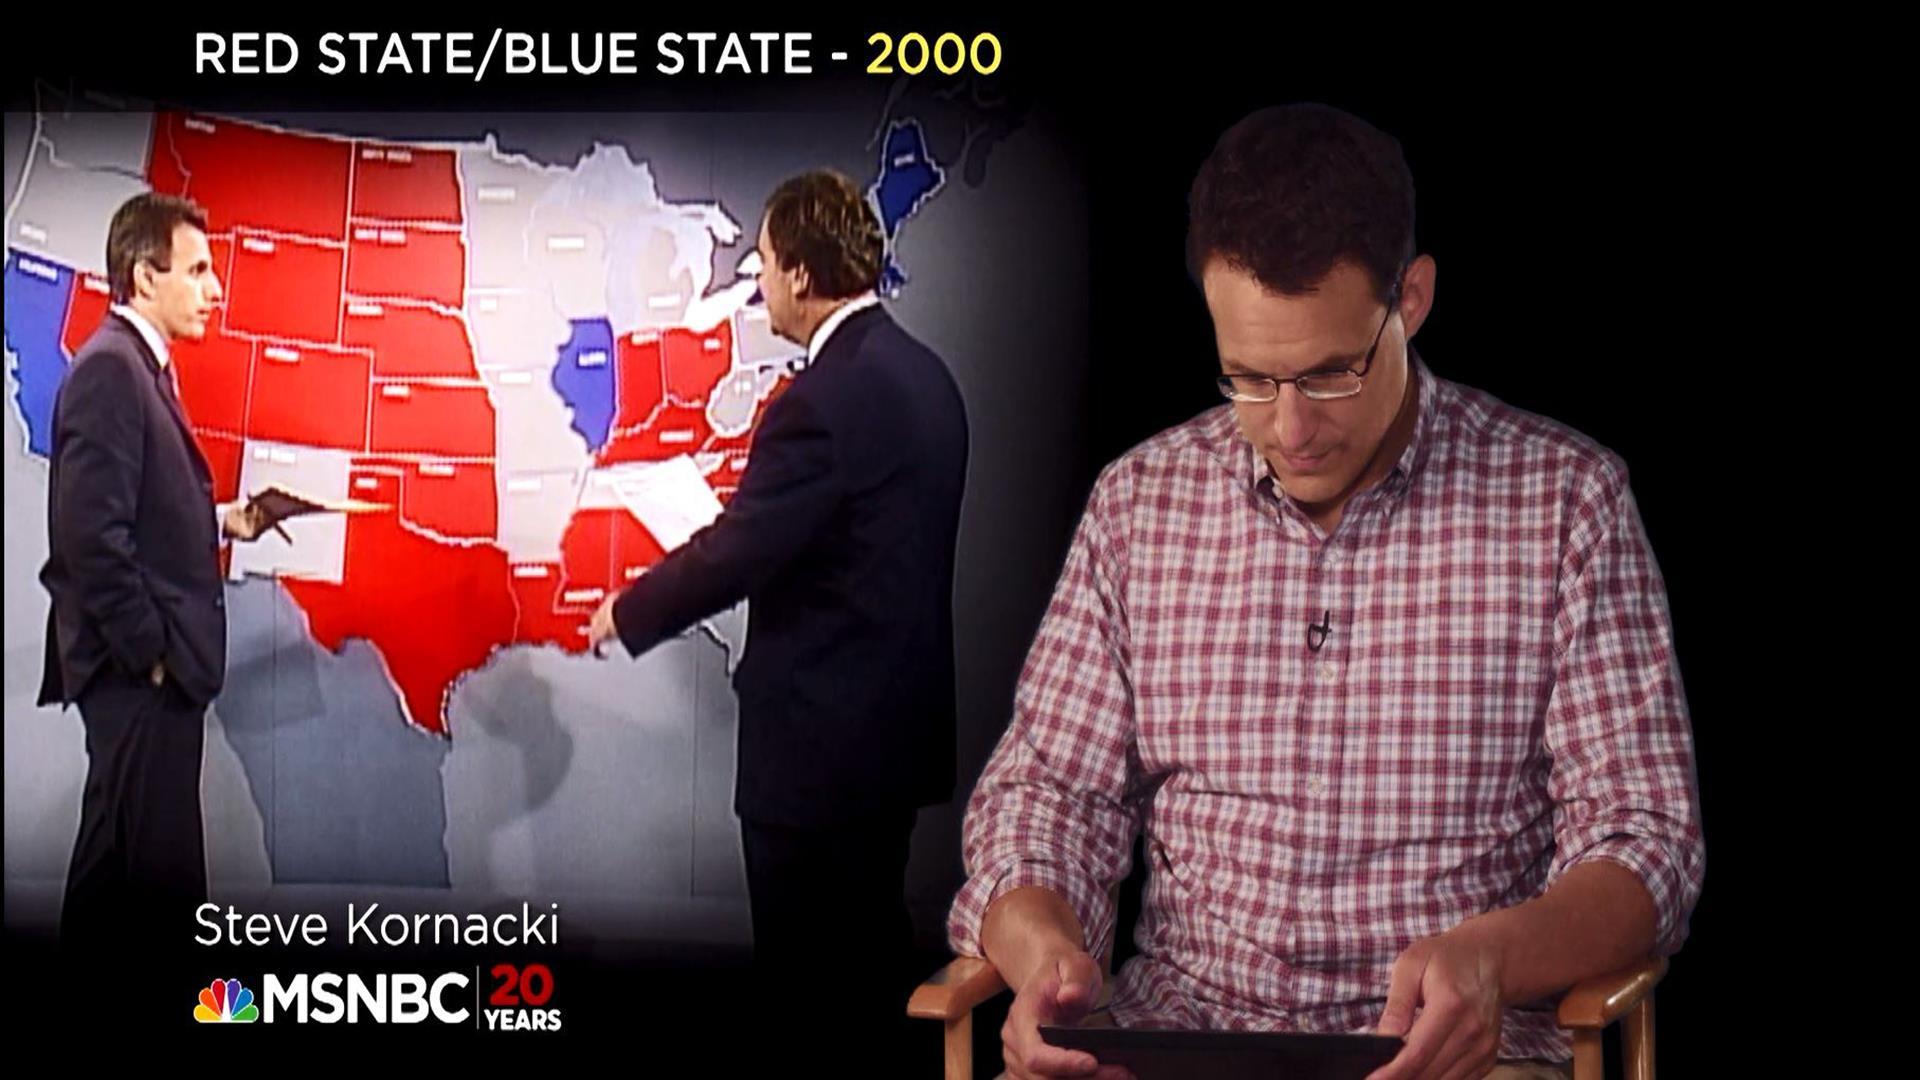 Steve Kornacki on the Origin of Red States...